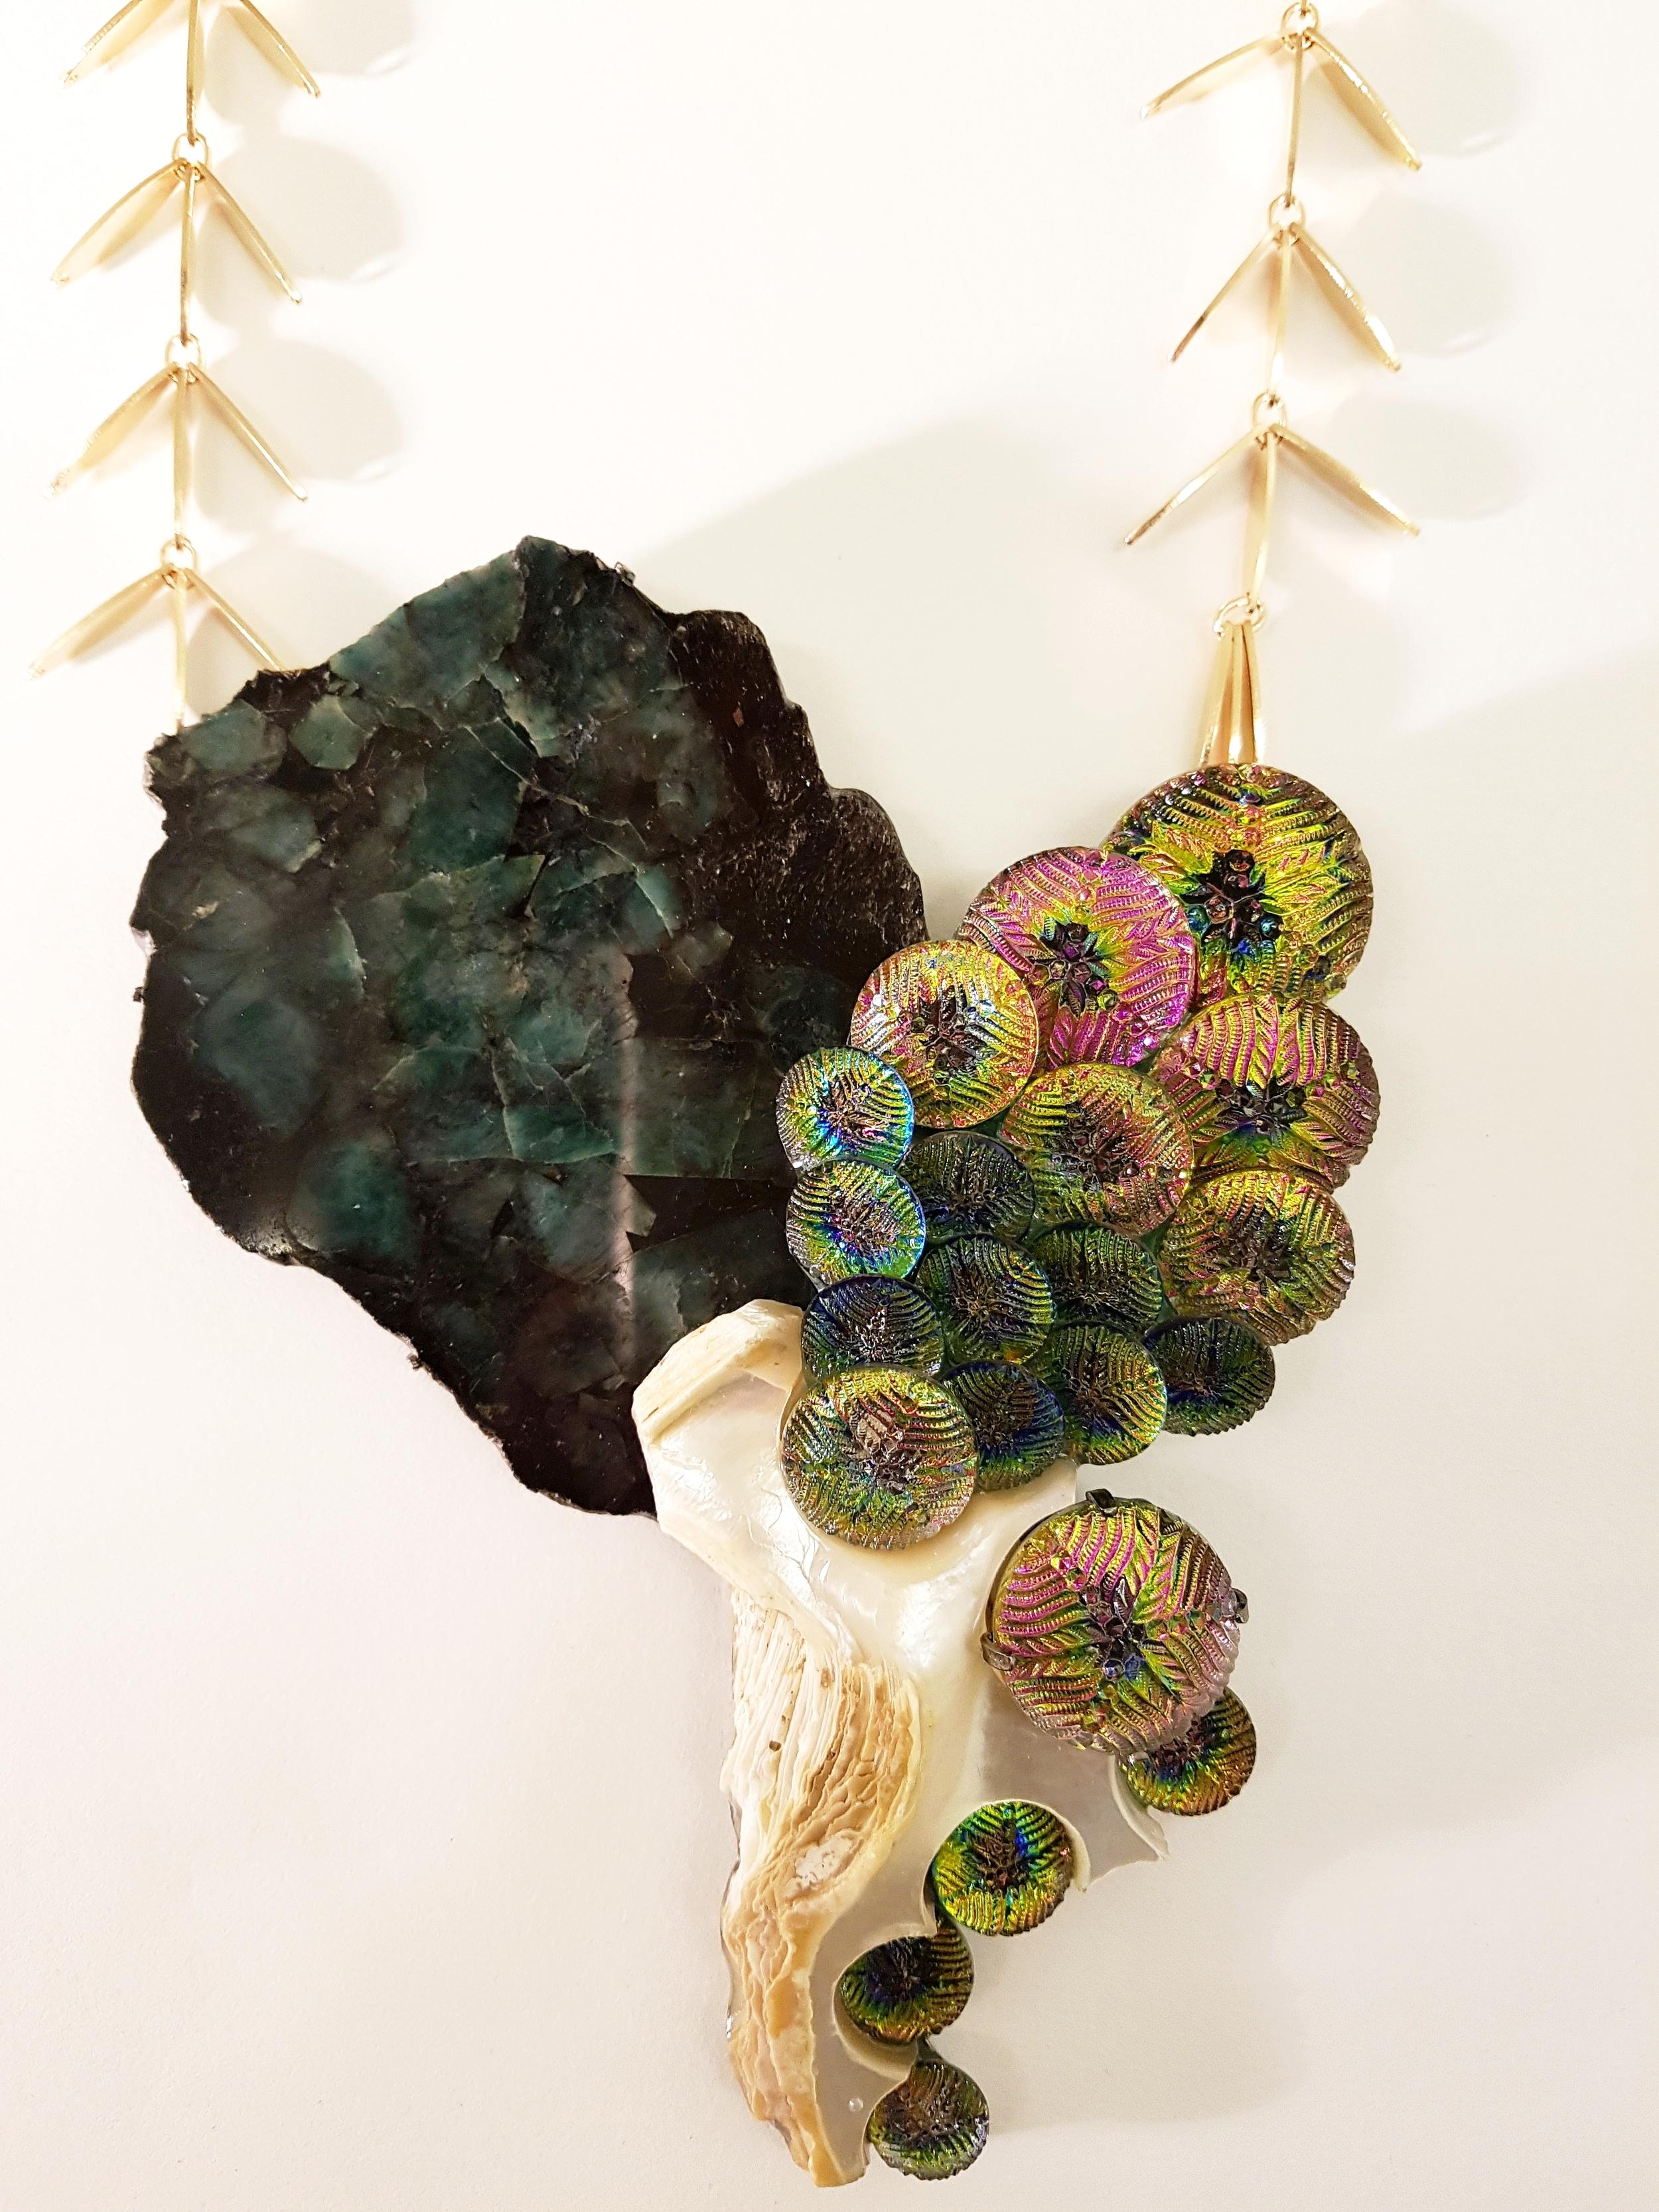 Meeting the jewellery artist Tamara Gruner with her ecclectic, organic work at Munich Jewellery Week 2017.